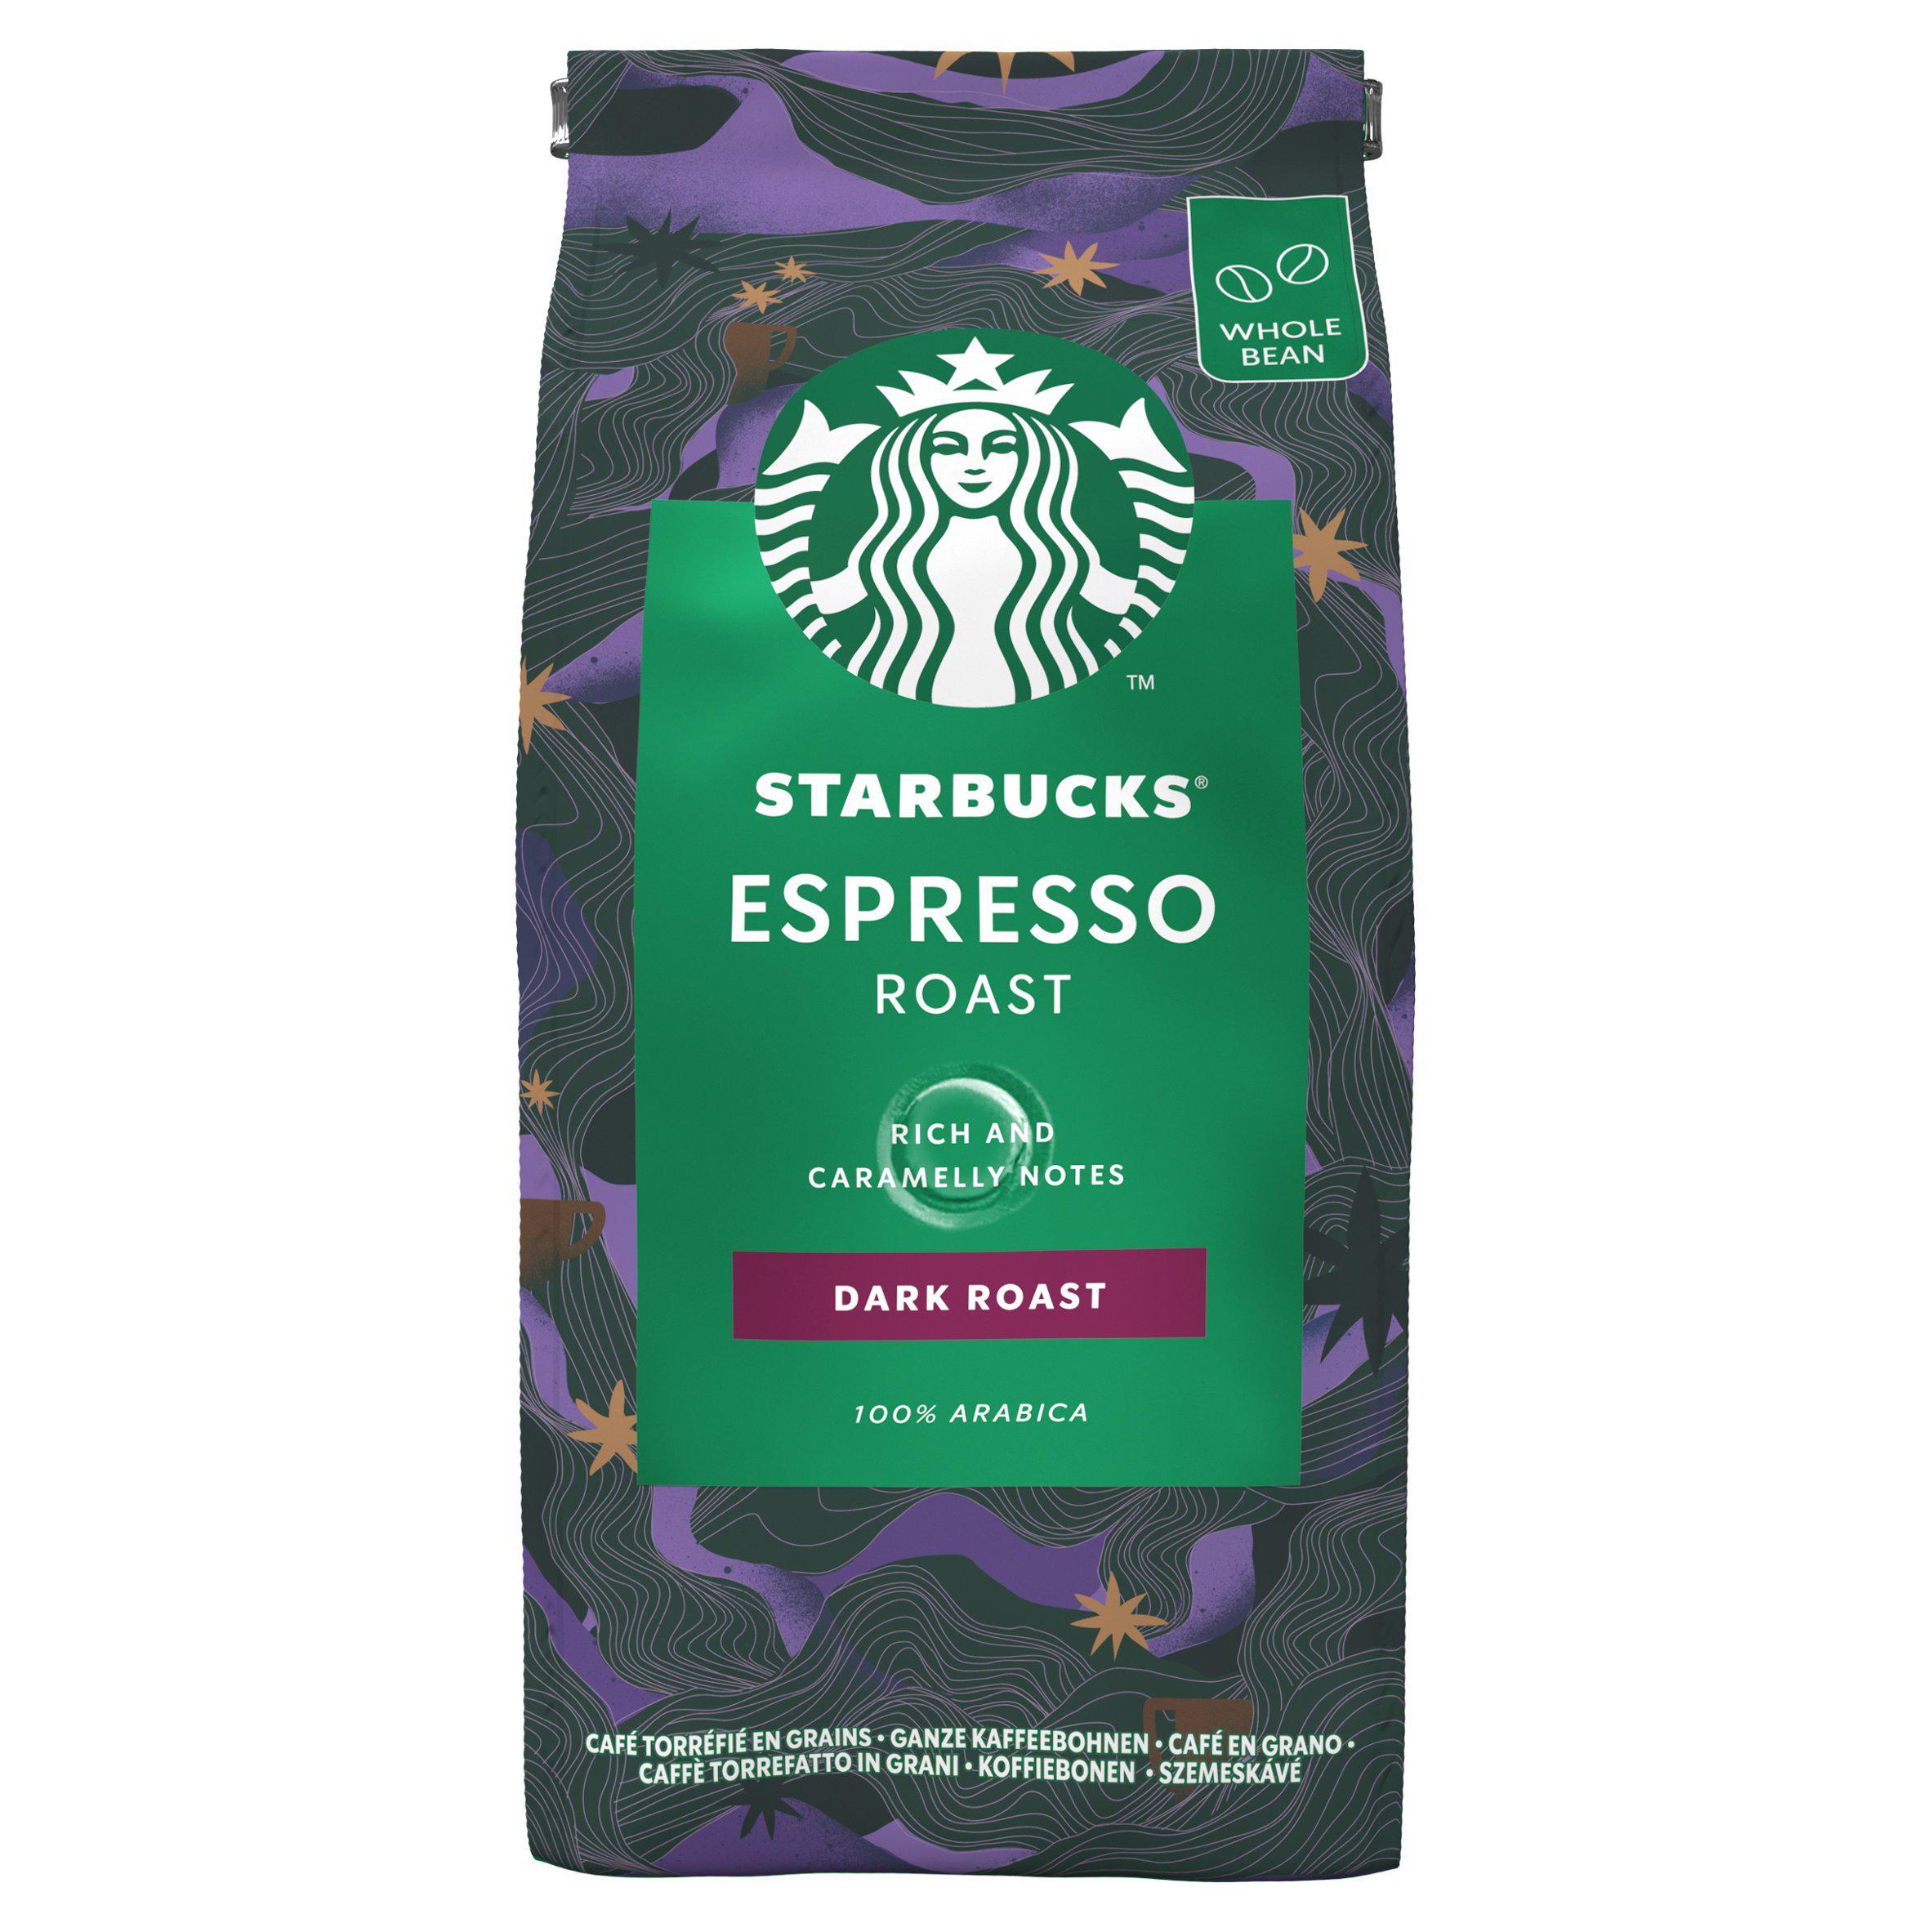 Starbucks Fairtrade Espresso Roast Dark Whole Bean 100% Arabica Coffee Bag 200g - £2.50 @ Sainsbury's